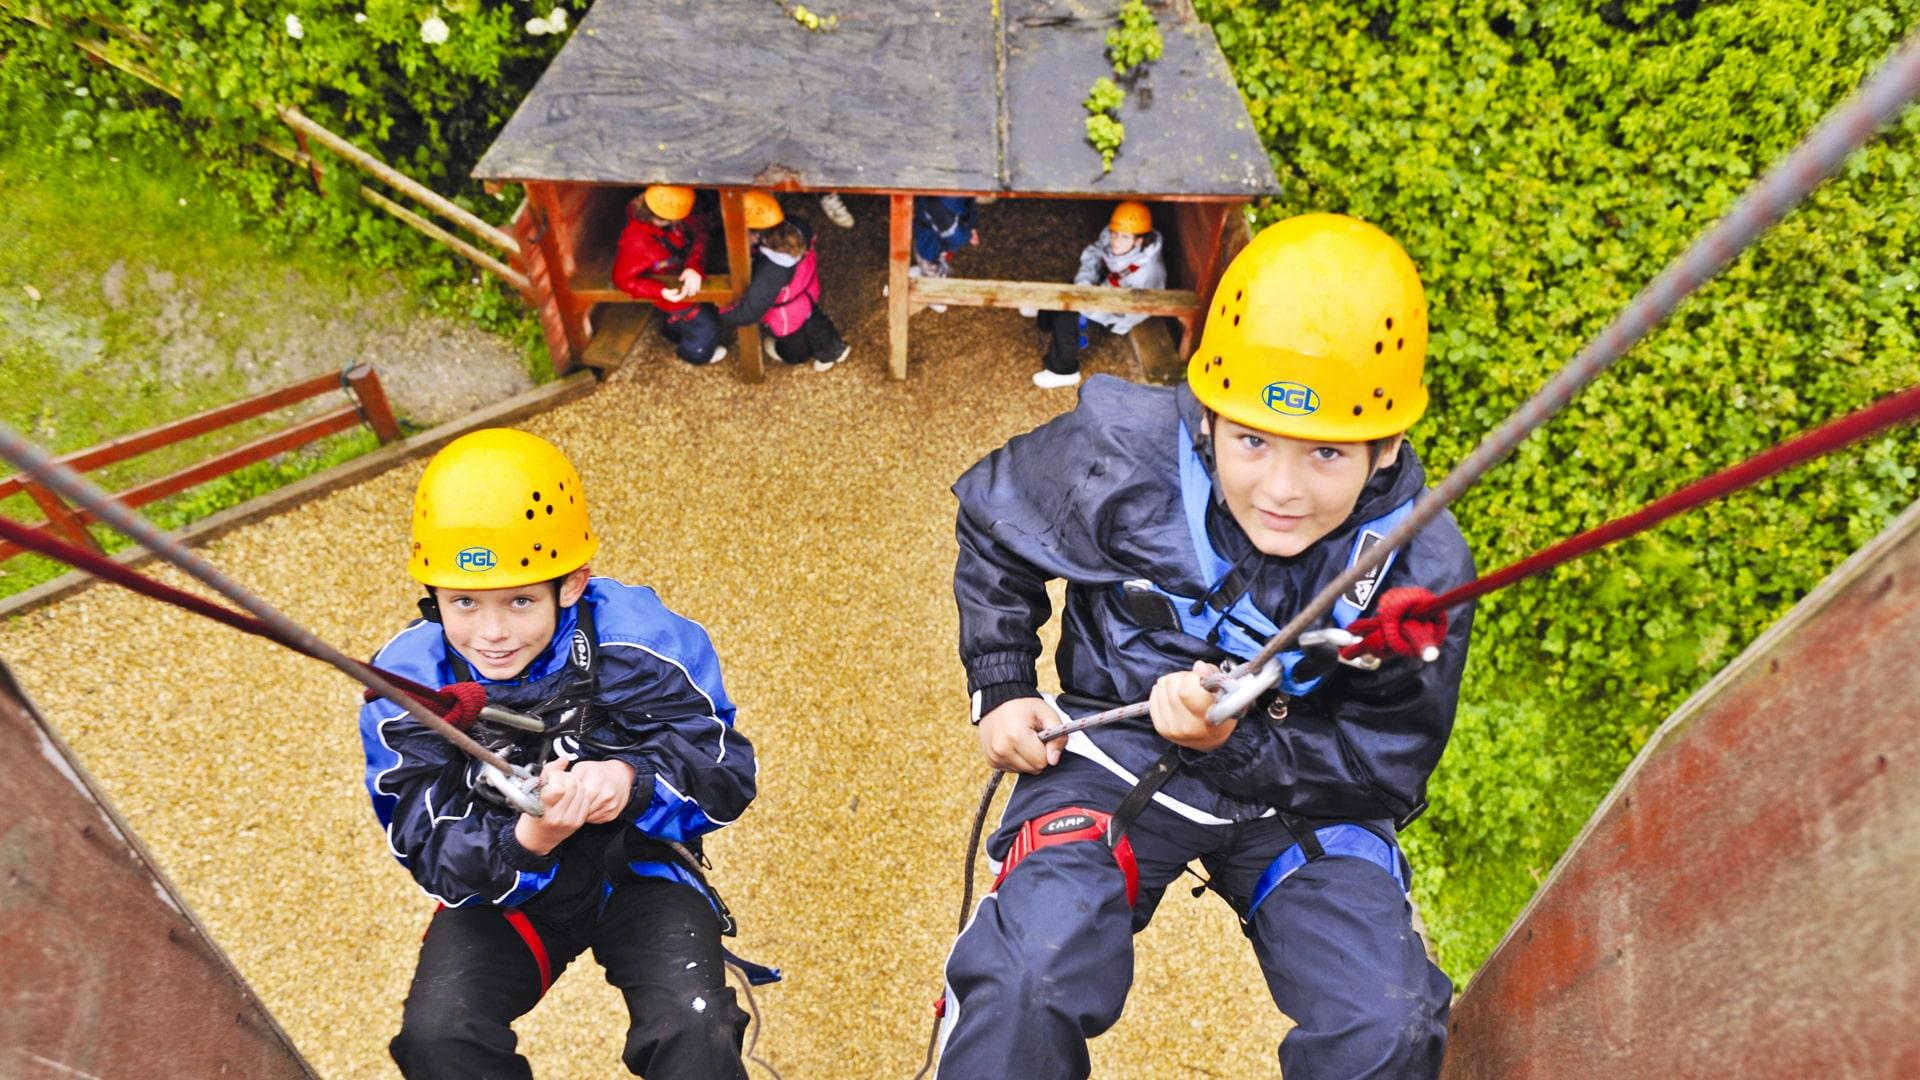 Campamento de verano multiaventura con niños ingleses en Inglaterra